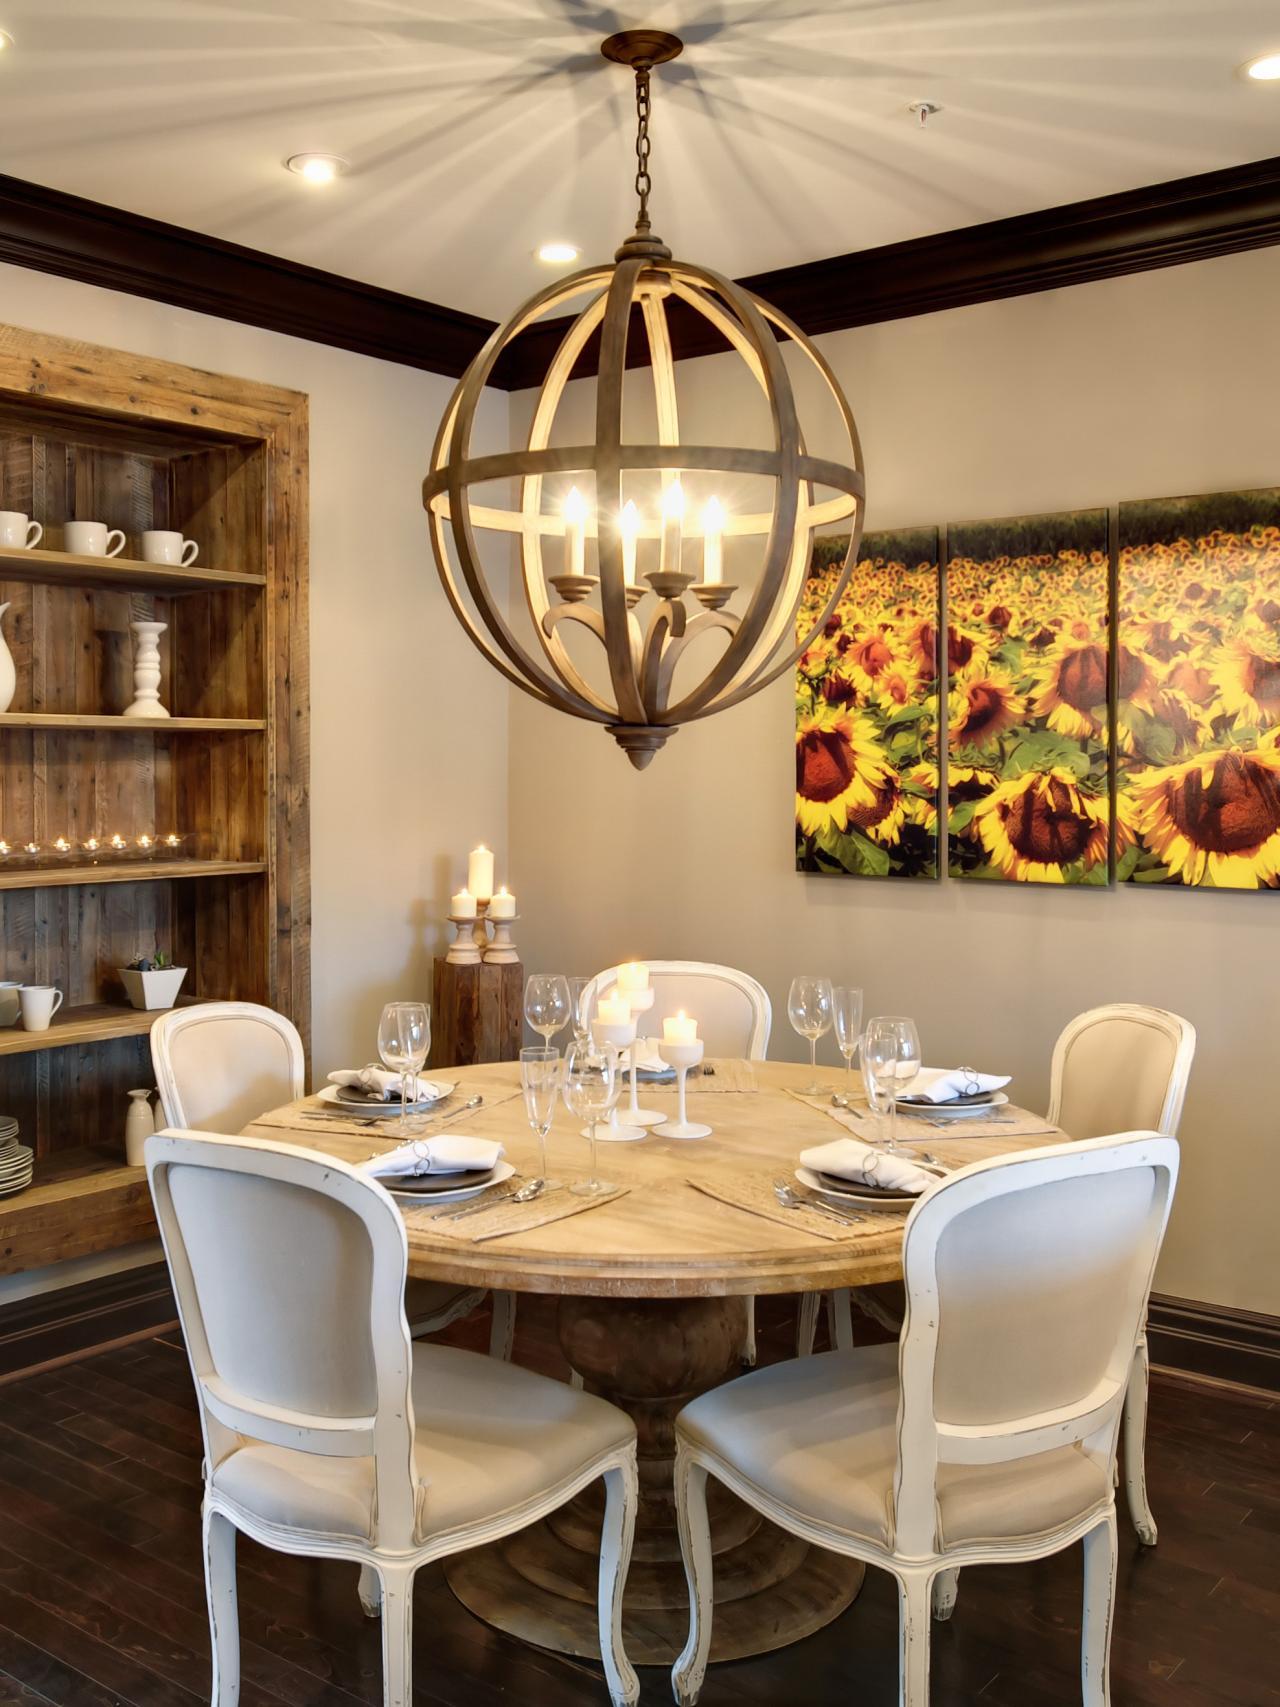 design by ani semerjian - Breakfast Room Lighting